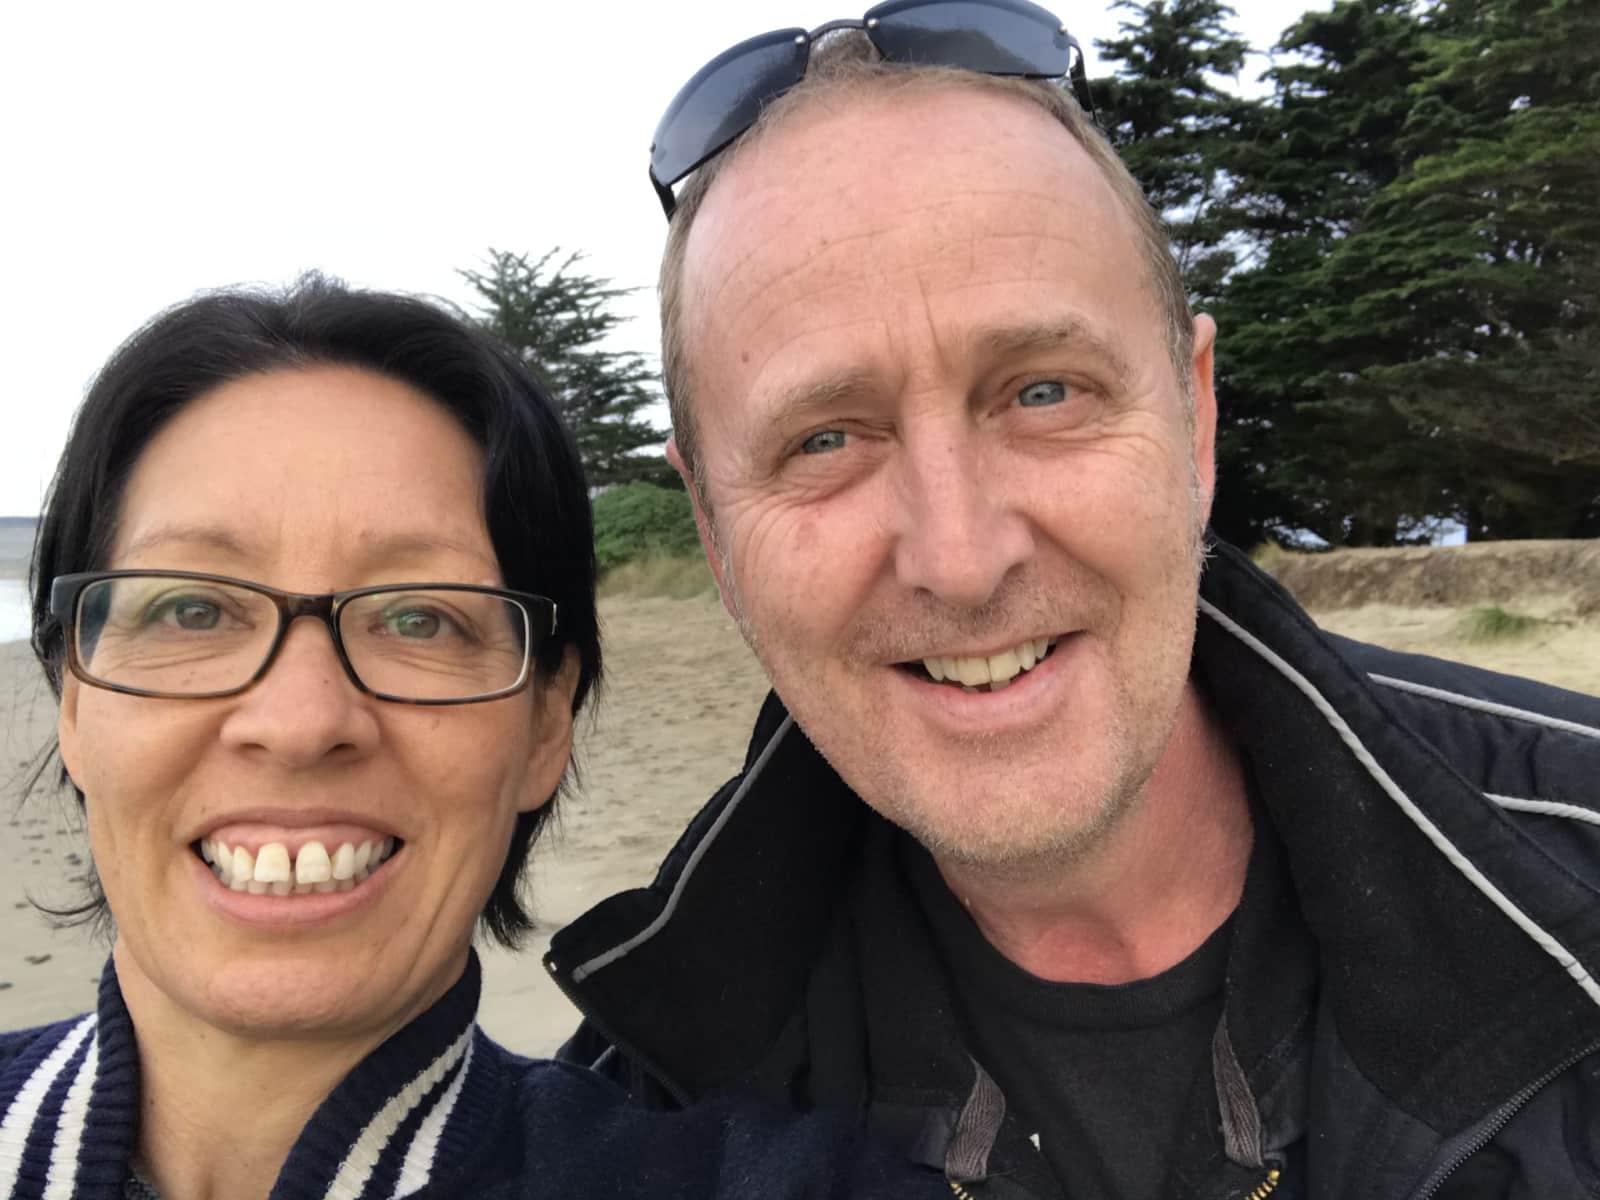 Jaxin & Russ from Gold Coast, Queensland, Australia